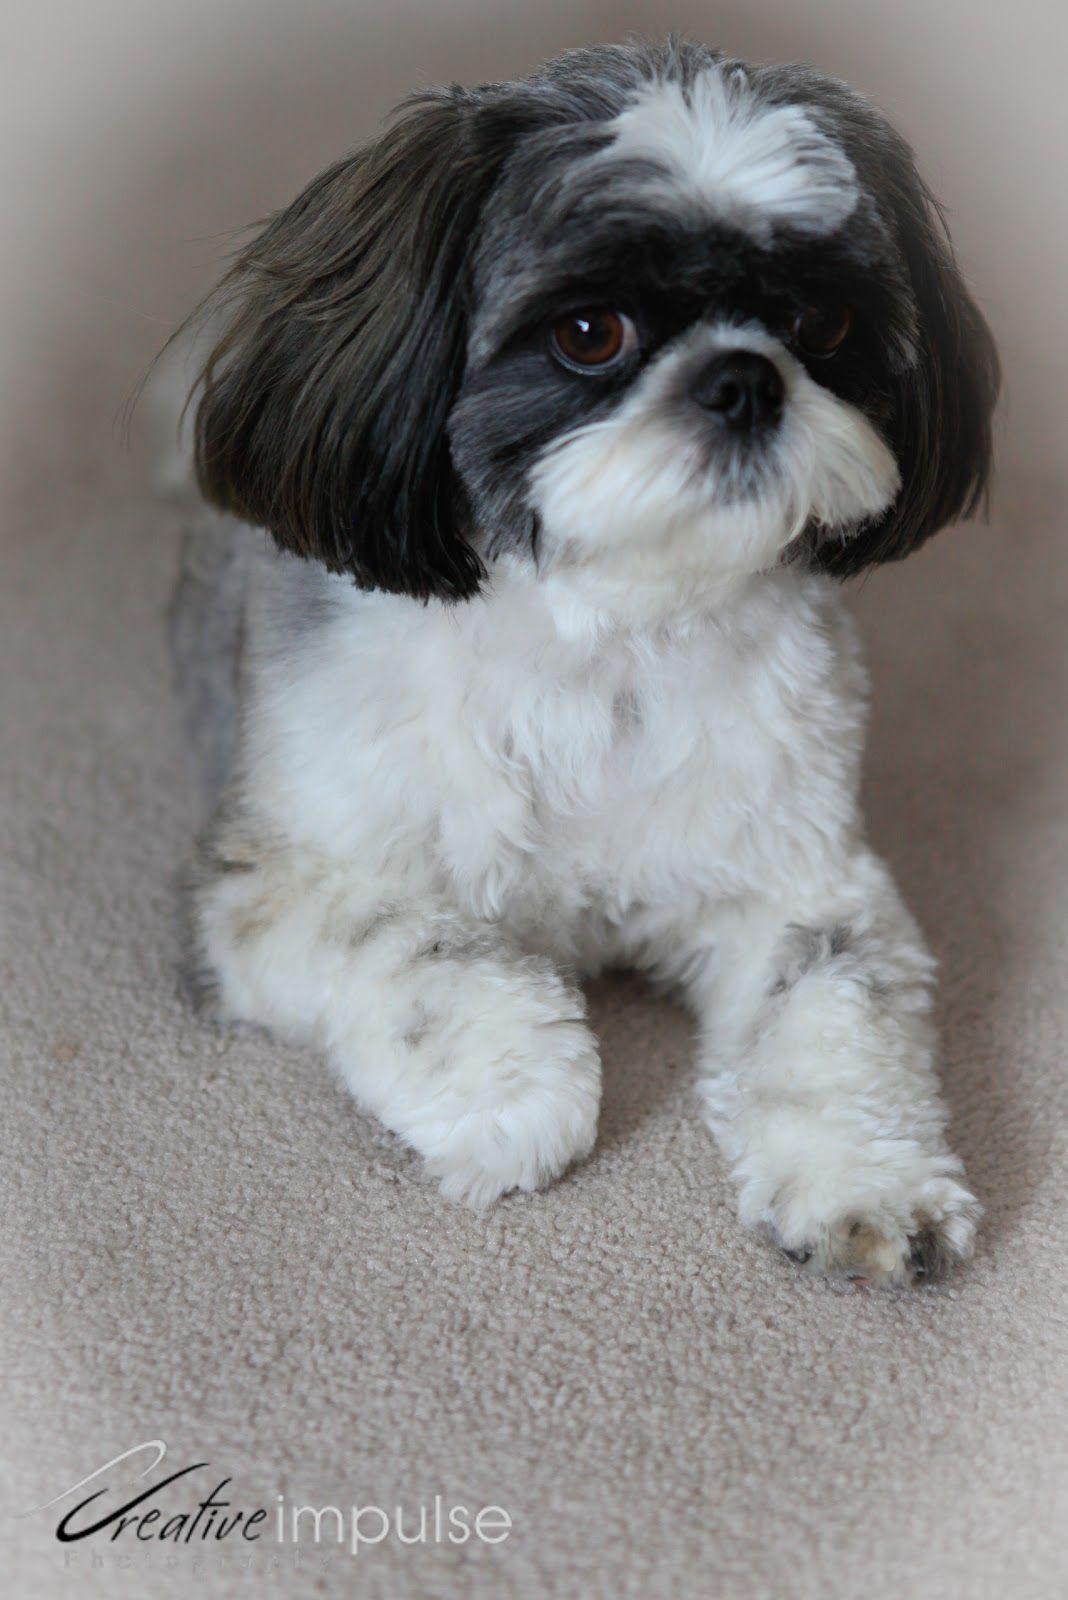 Shih Tzu Husky Mix Dog Breeds Picture Shih Tzu Dog Breeds